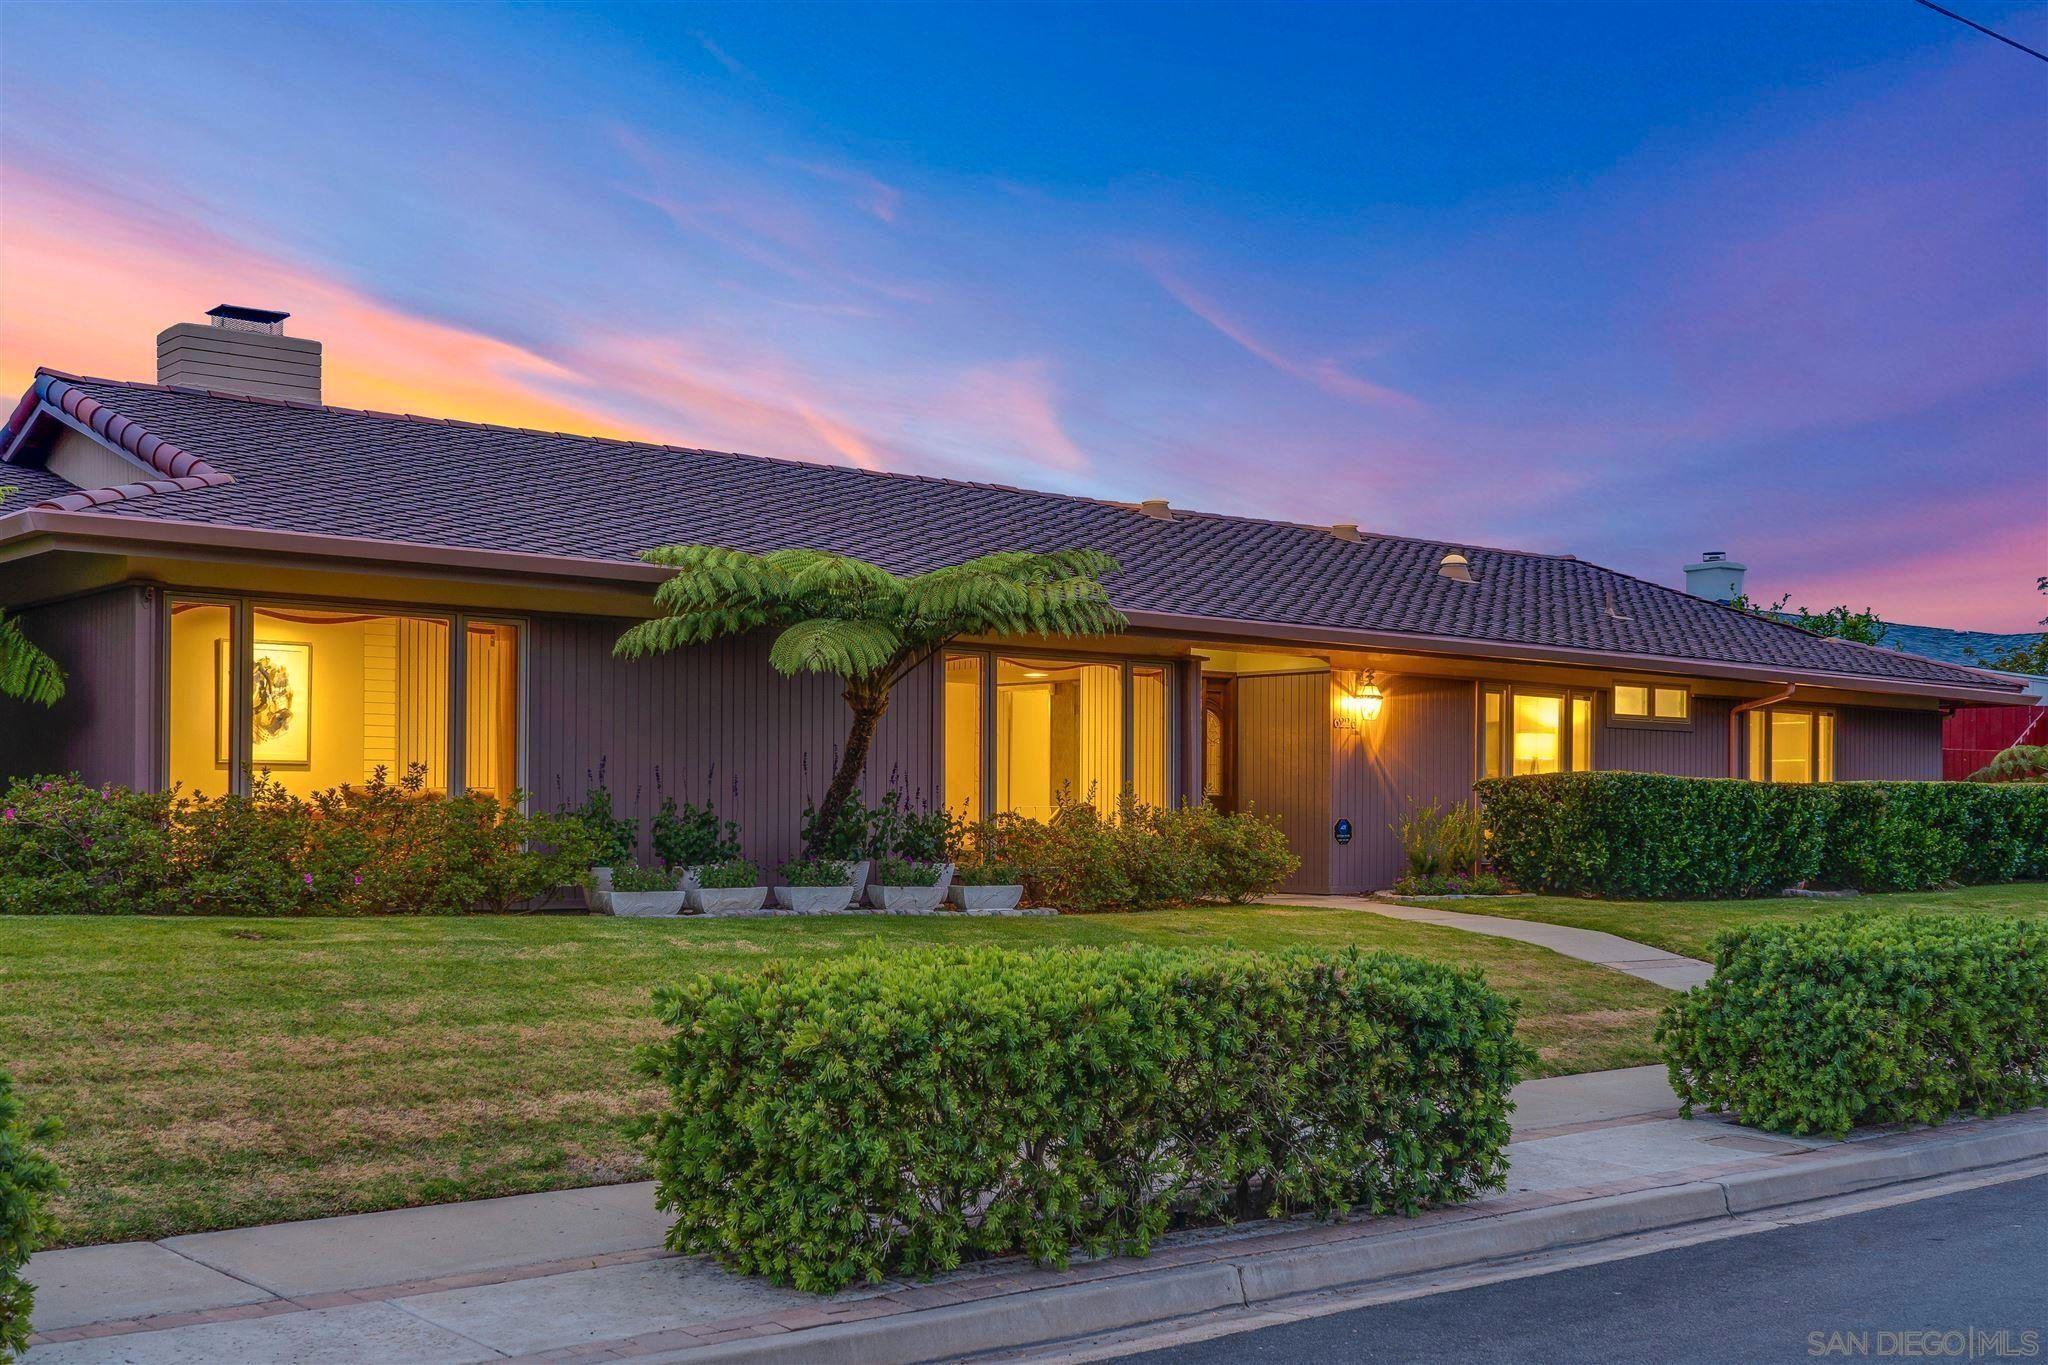 Main Photo: LA JOLLA House for sale : 4 bedrooms : 6226 Castejon Drive